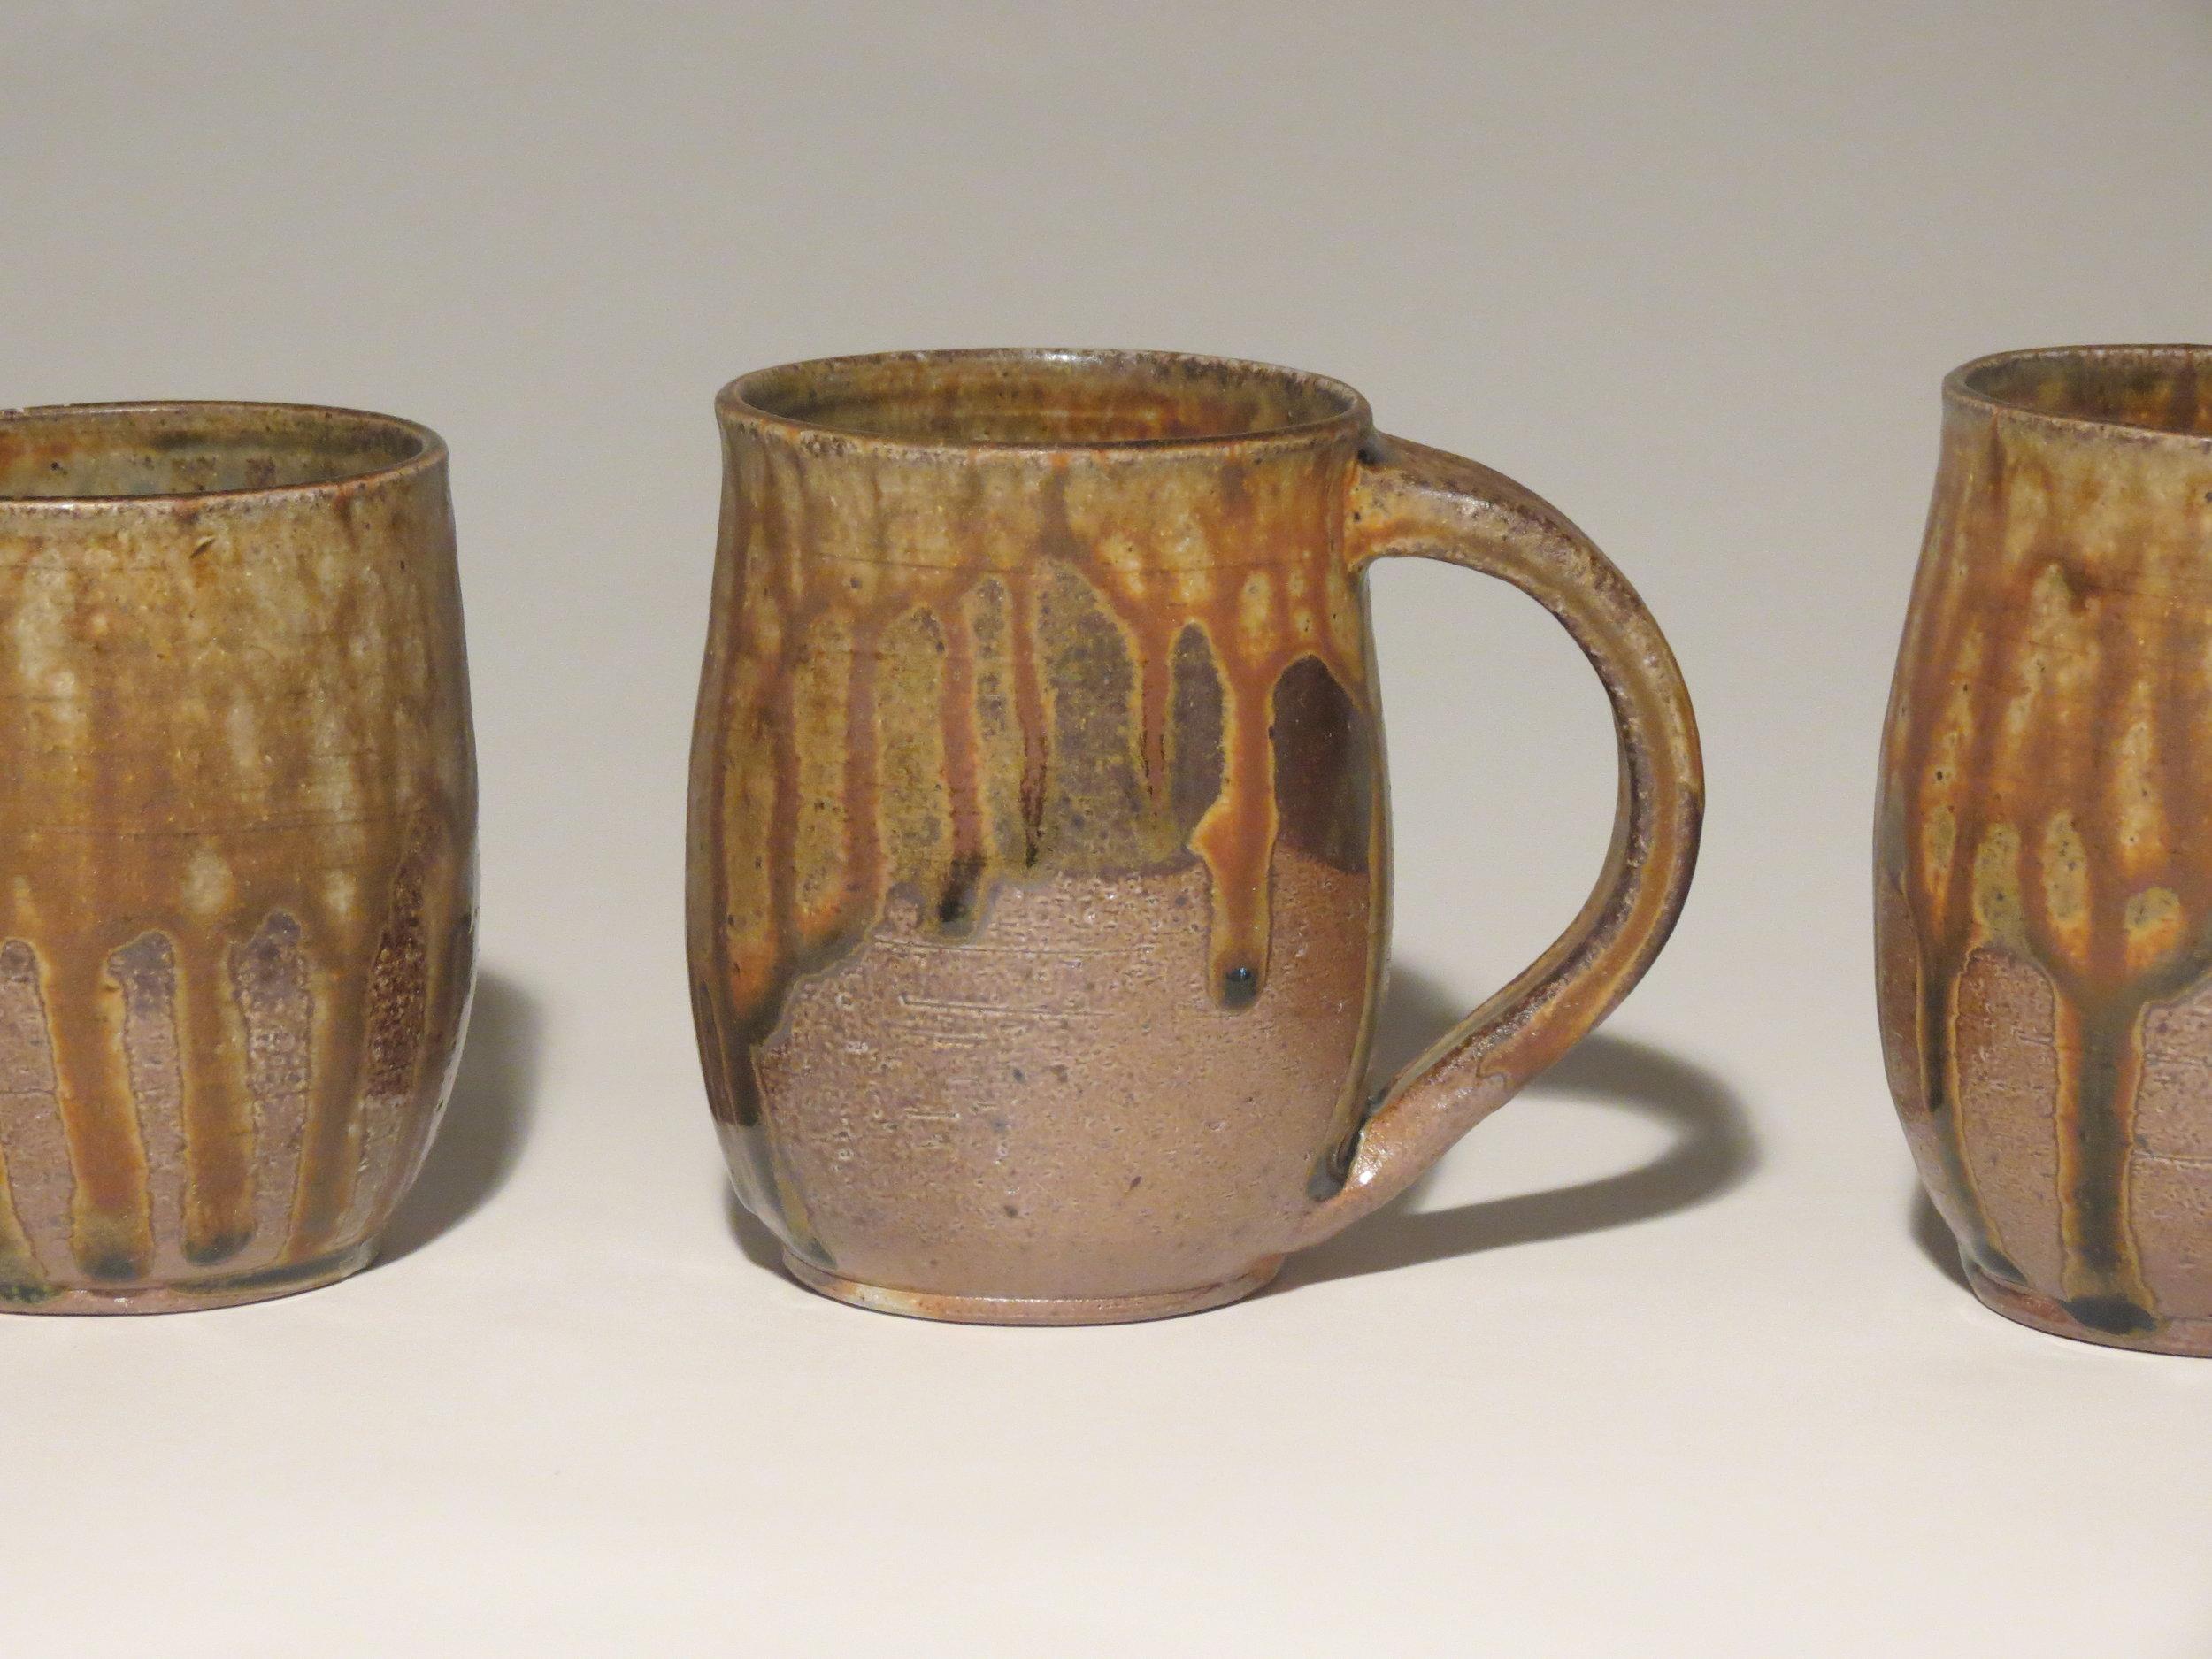 wood-fired mugs with ash and tenmoku glaze.